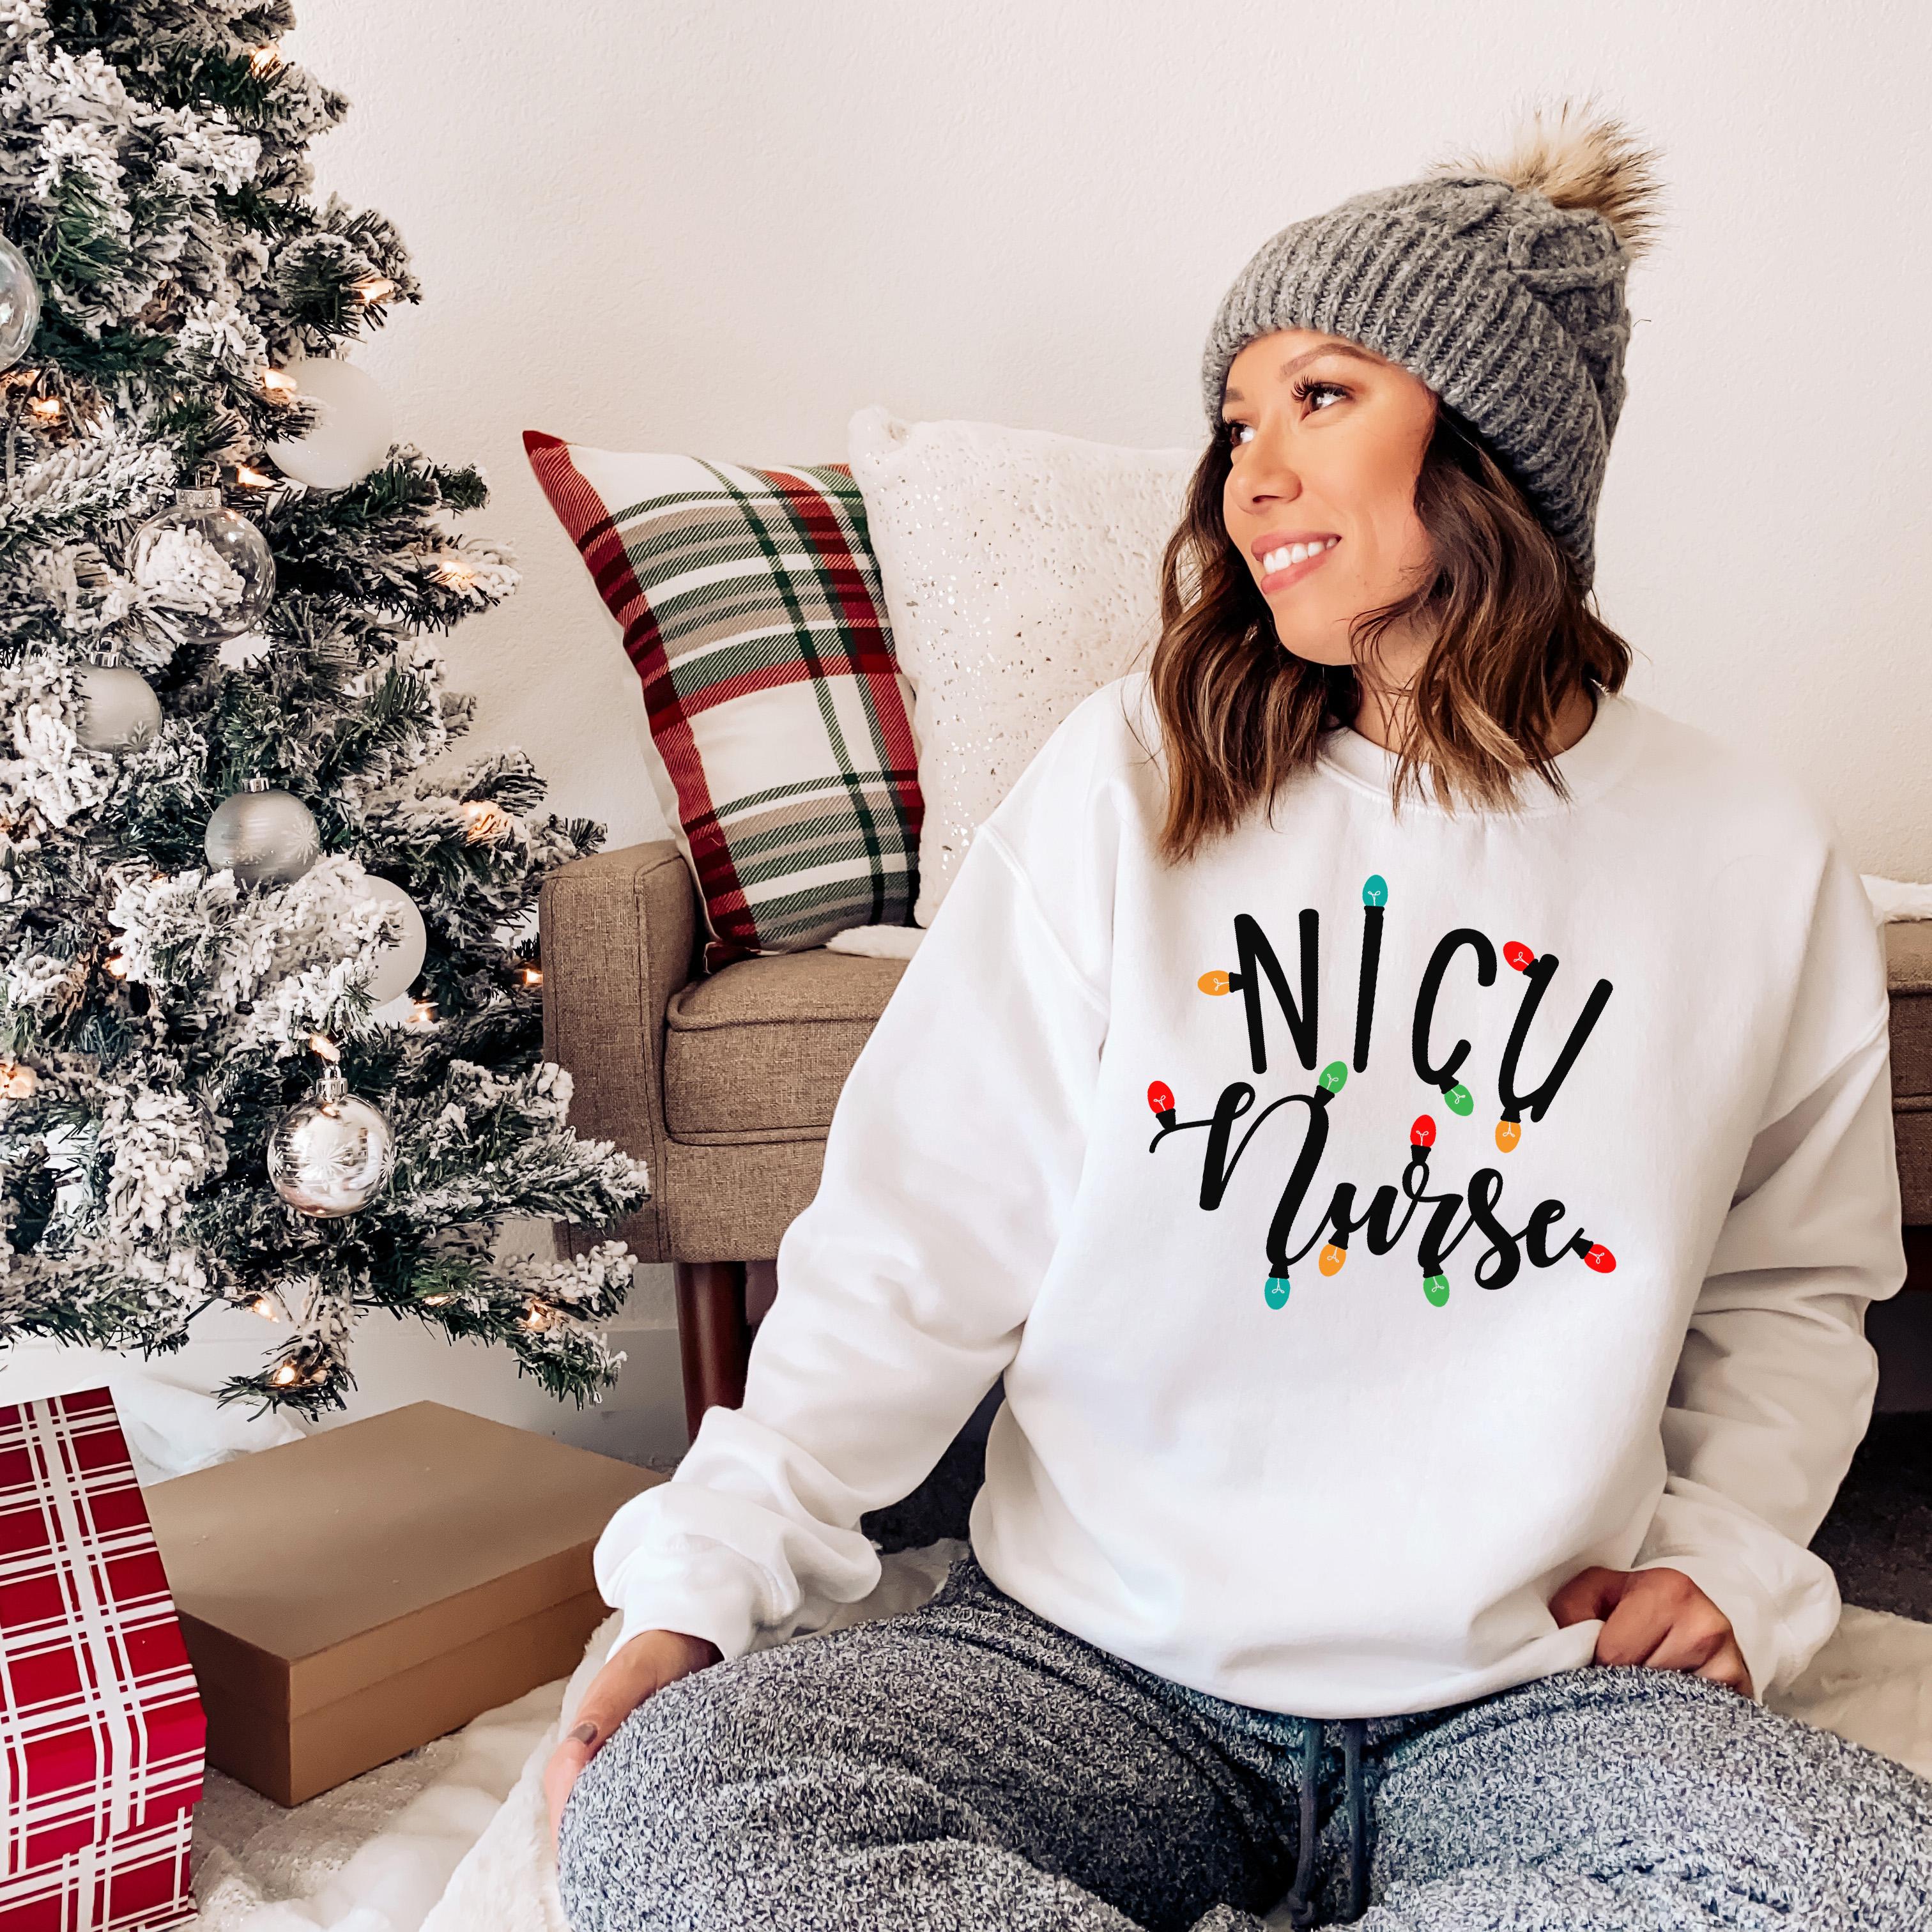 NICU Nurse   Christmas Lights   RN, CNA, Lpn   Neonatal Intensive Care Nurse   Christmas Gifts For Nurses   Unisex Crewneck Sweatshirt